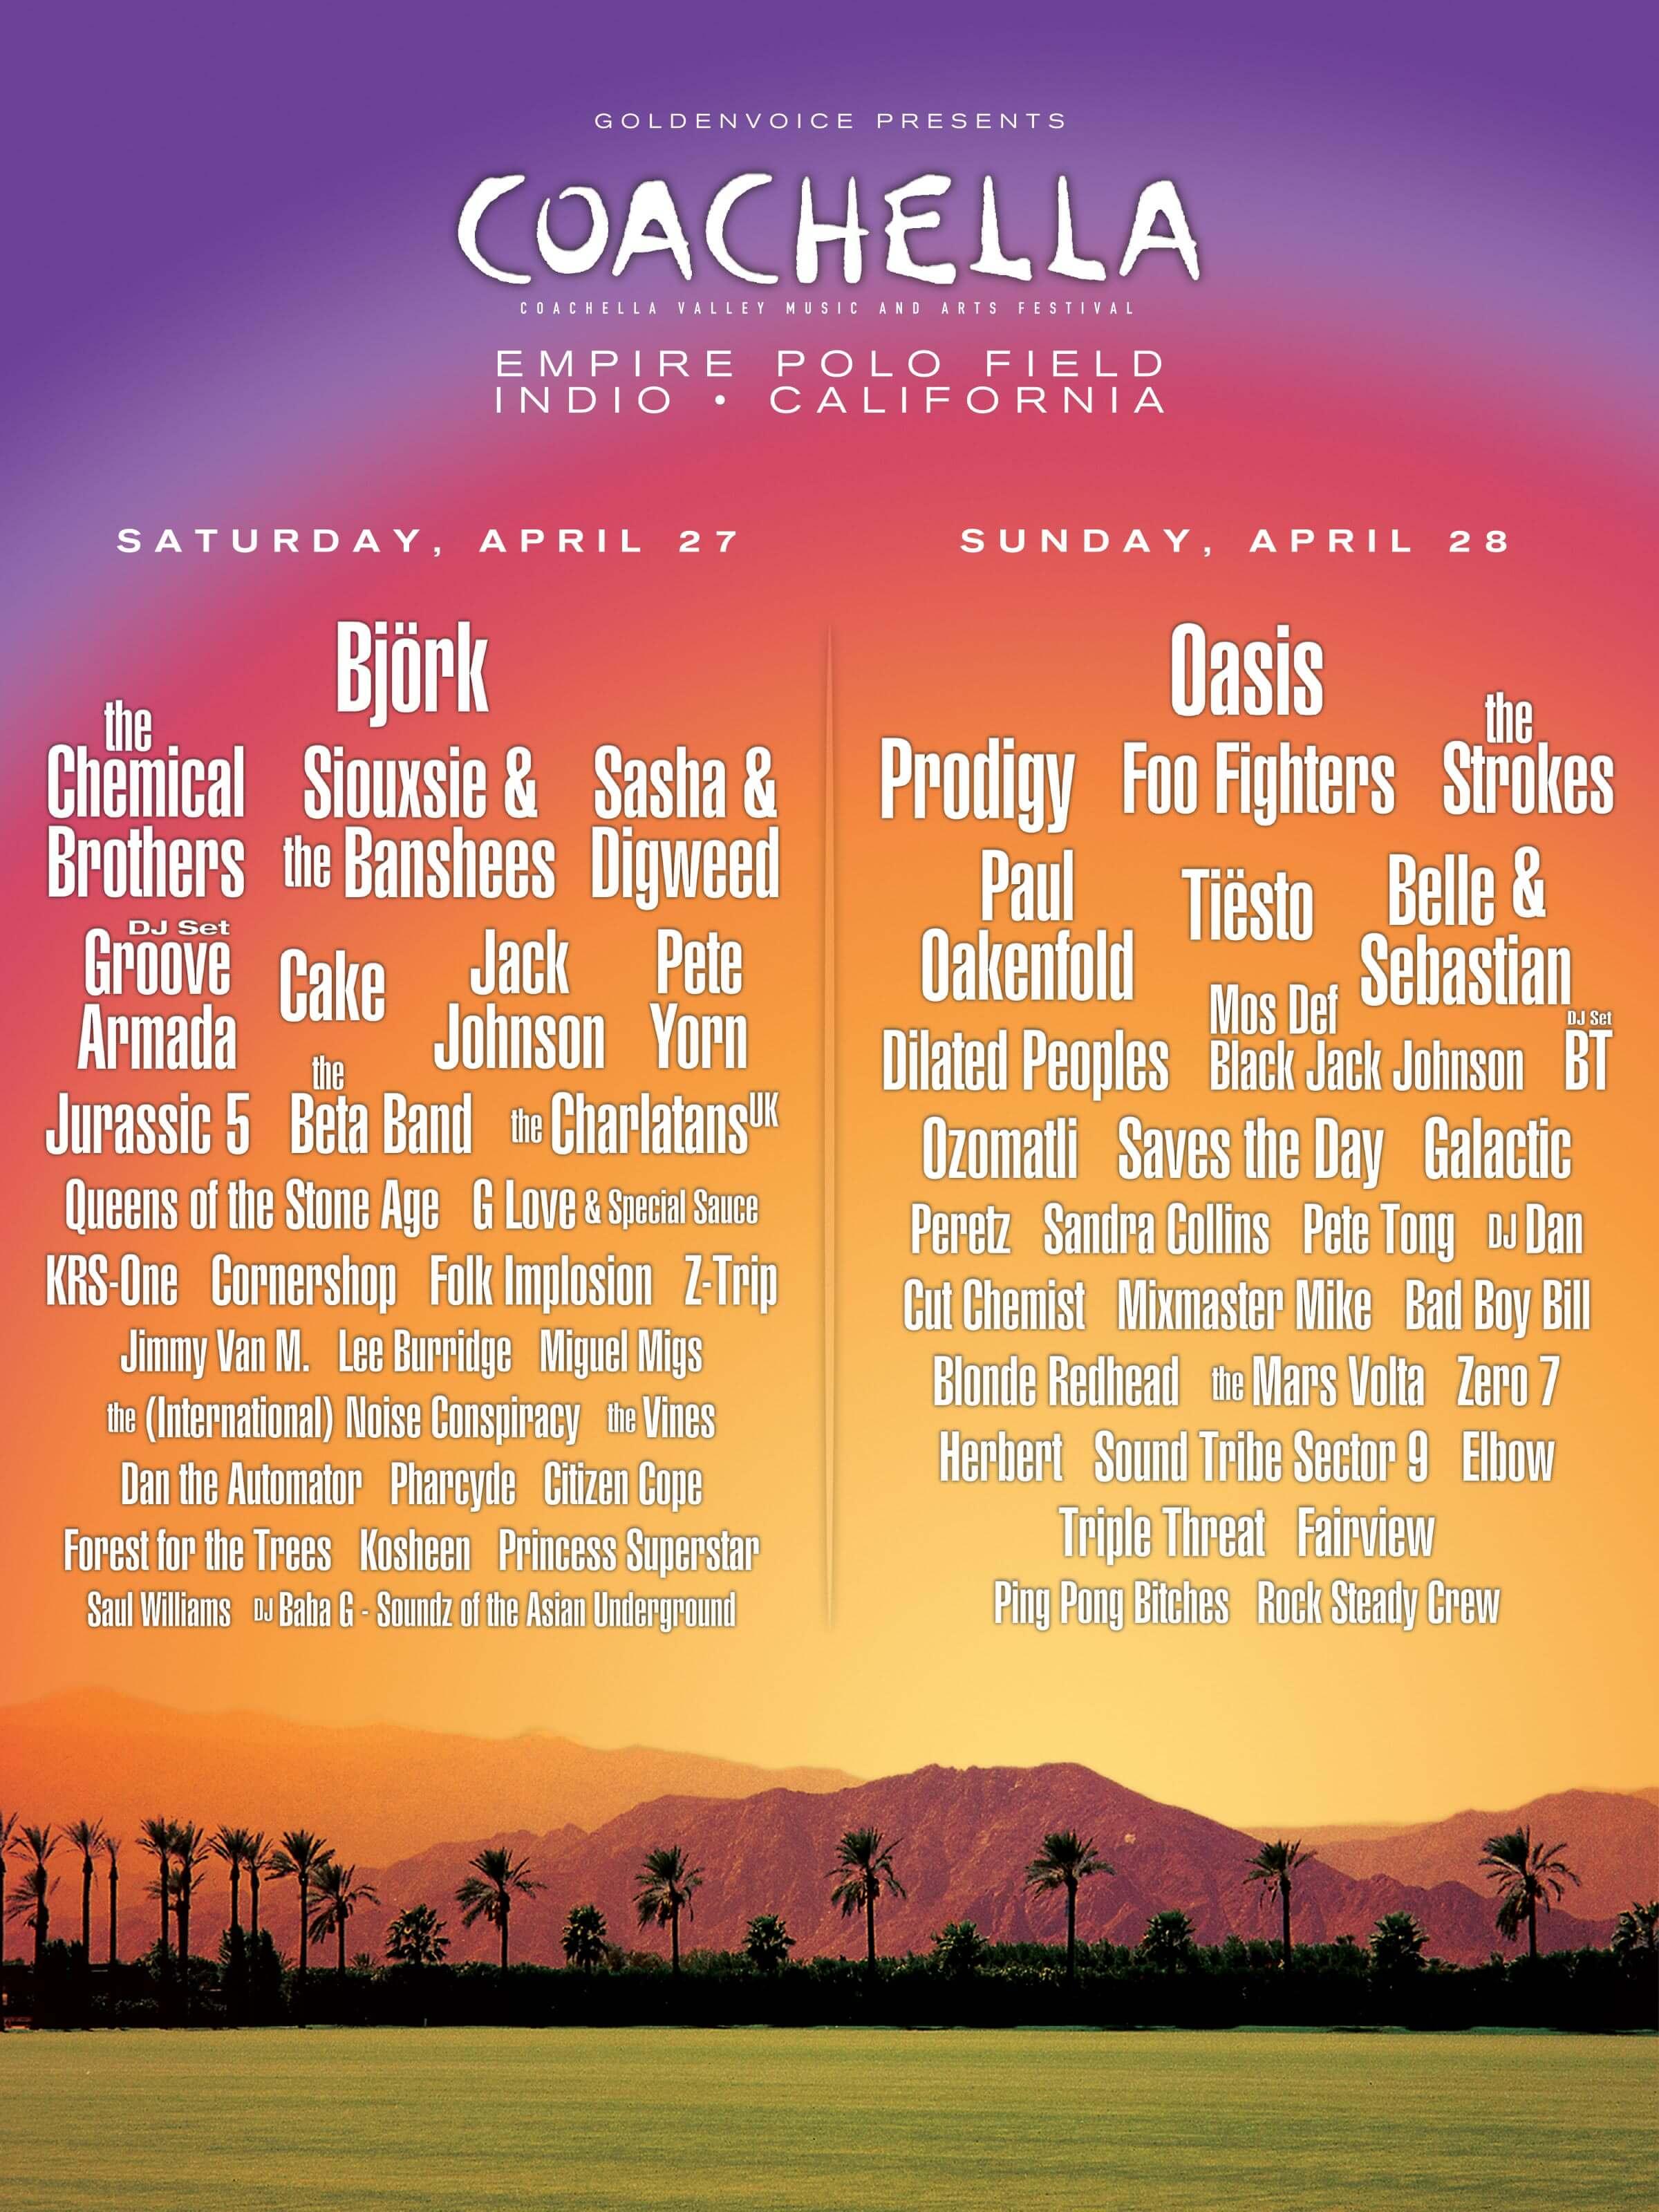 Coachella 2002 Lineup Poster